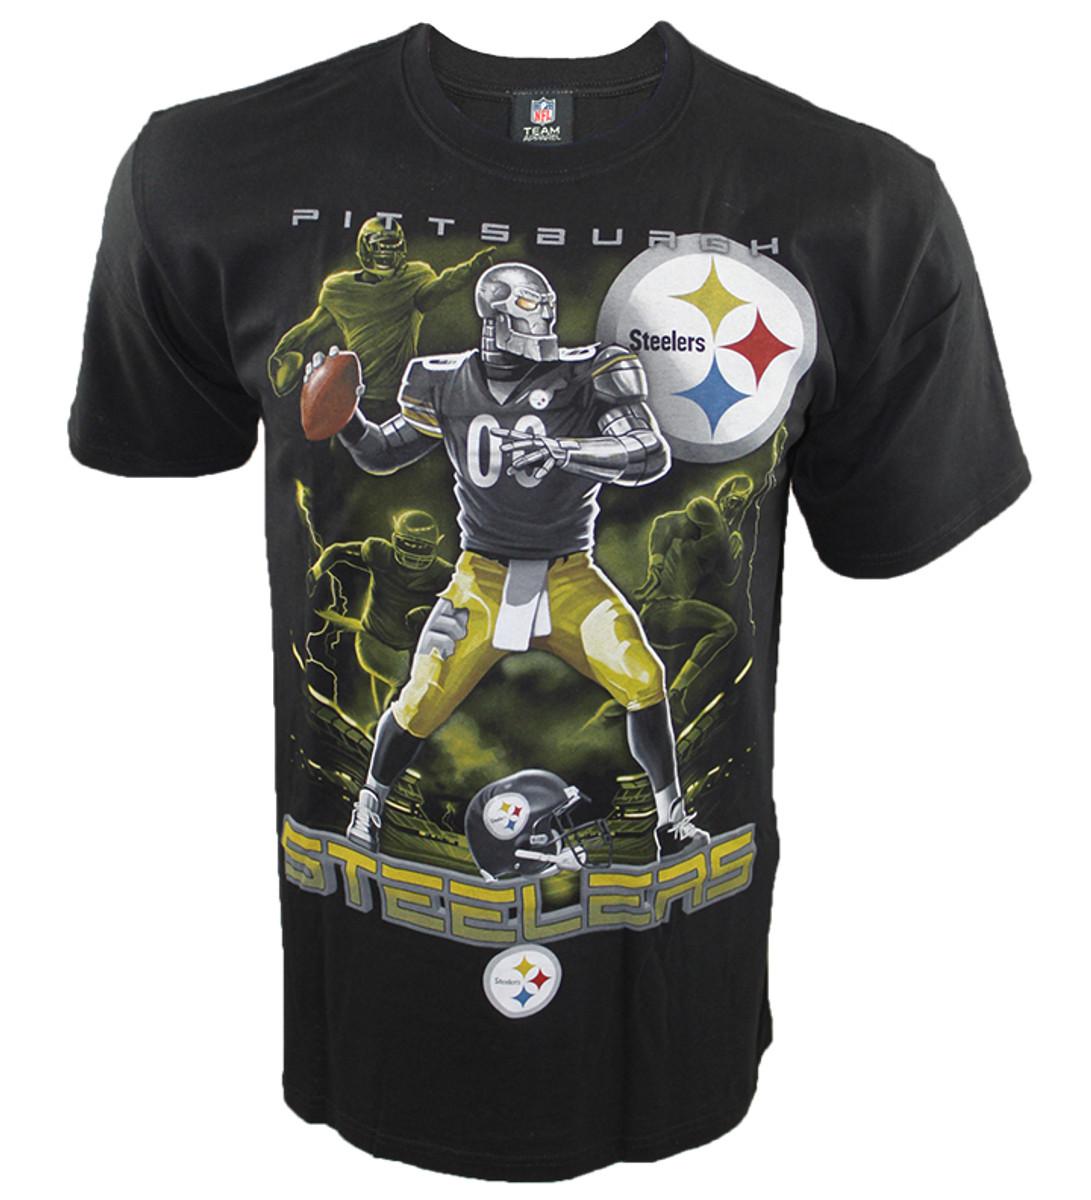 cheaper 18aa6 b548b Pittsburgh Steelers Antonio Brown Shirt